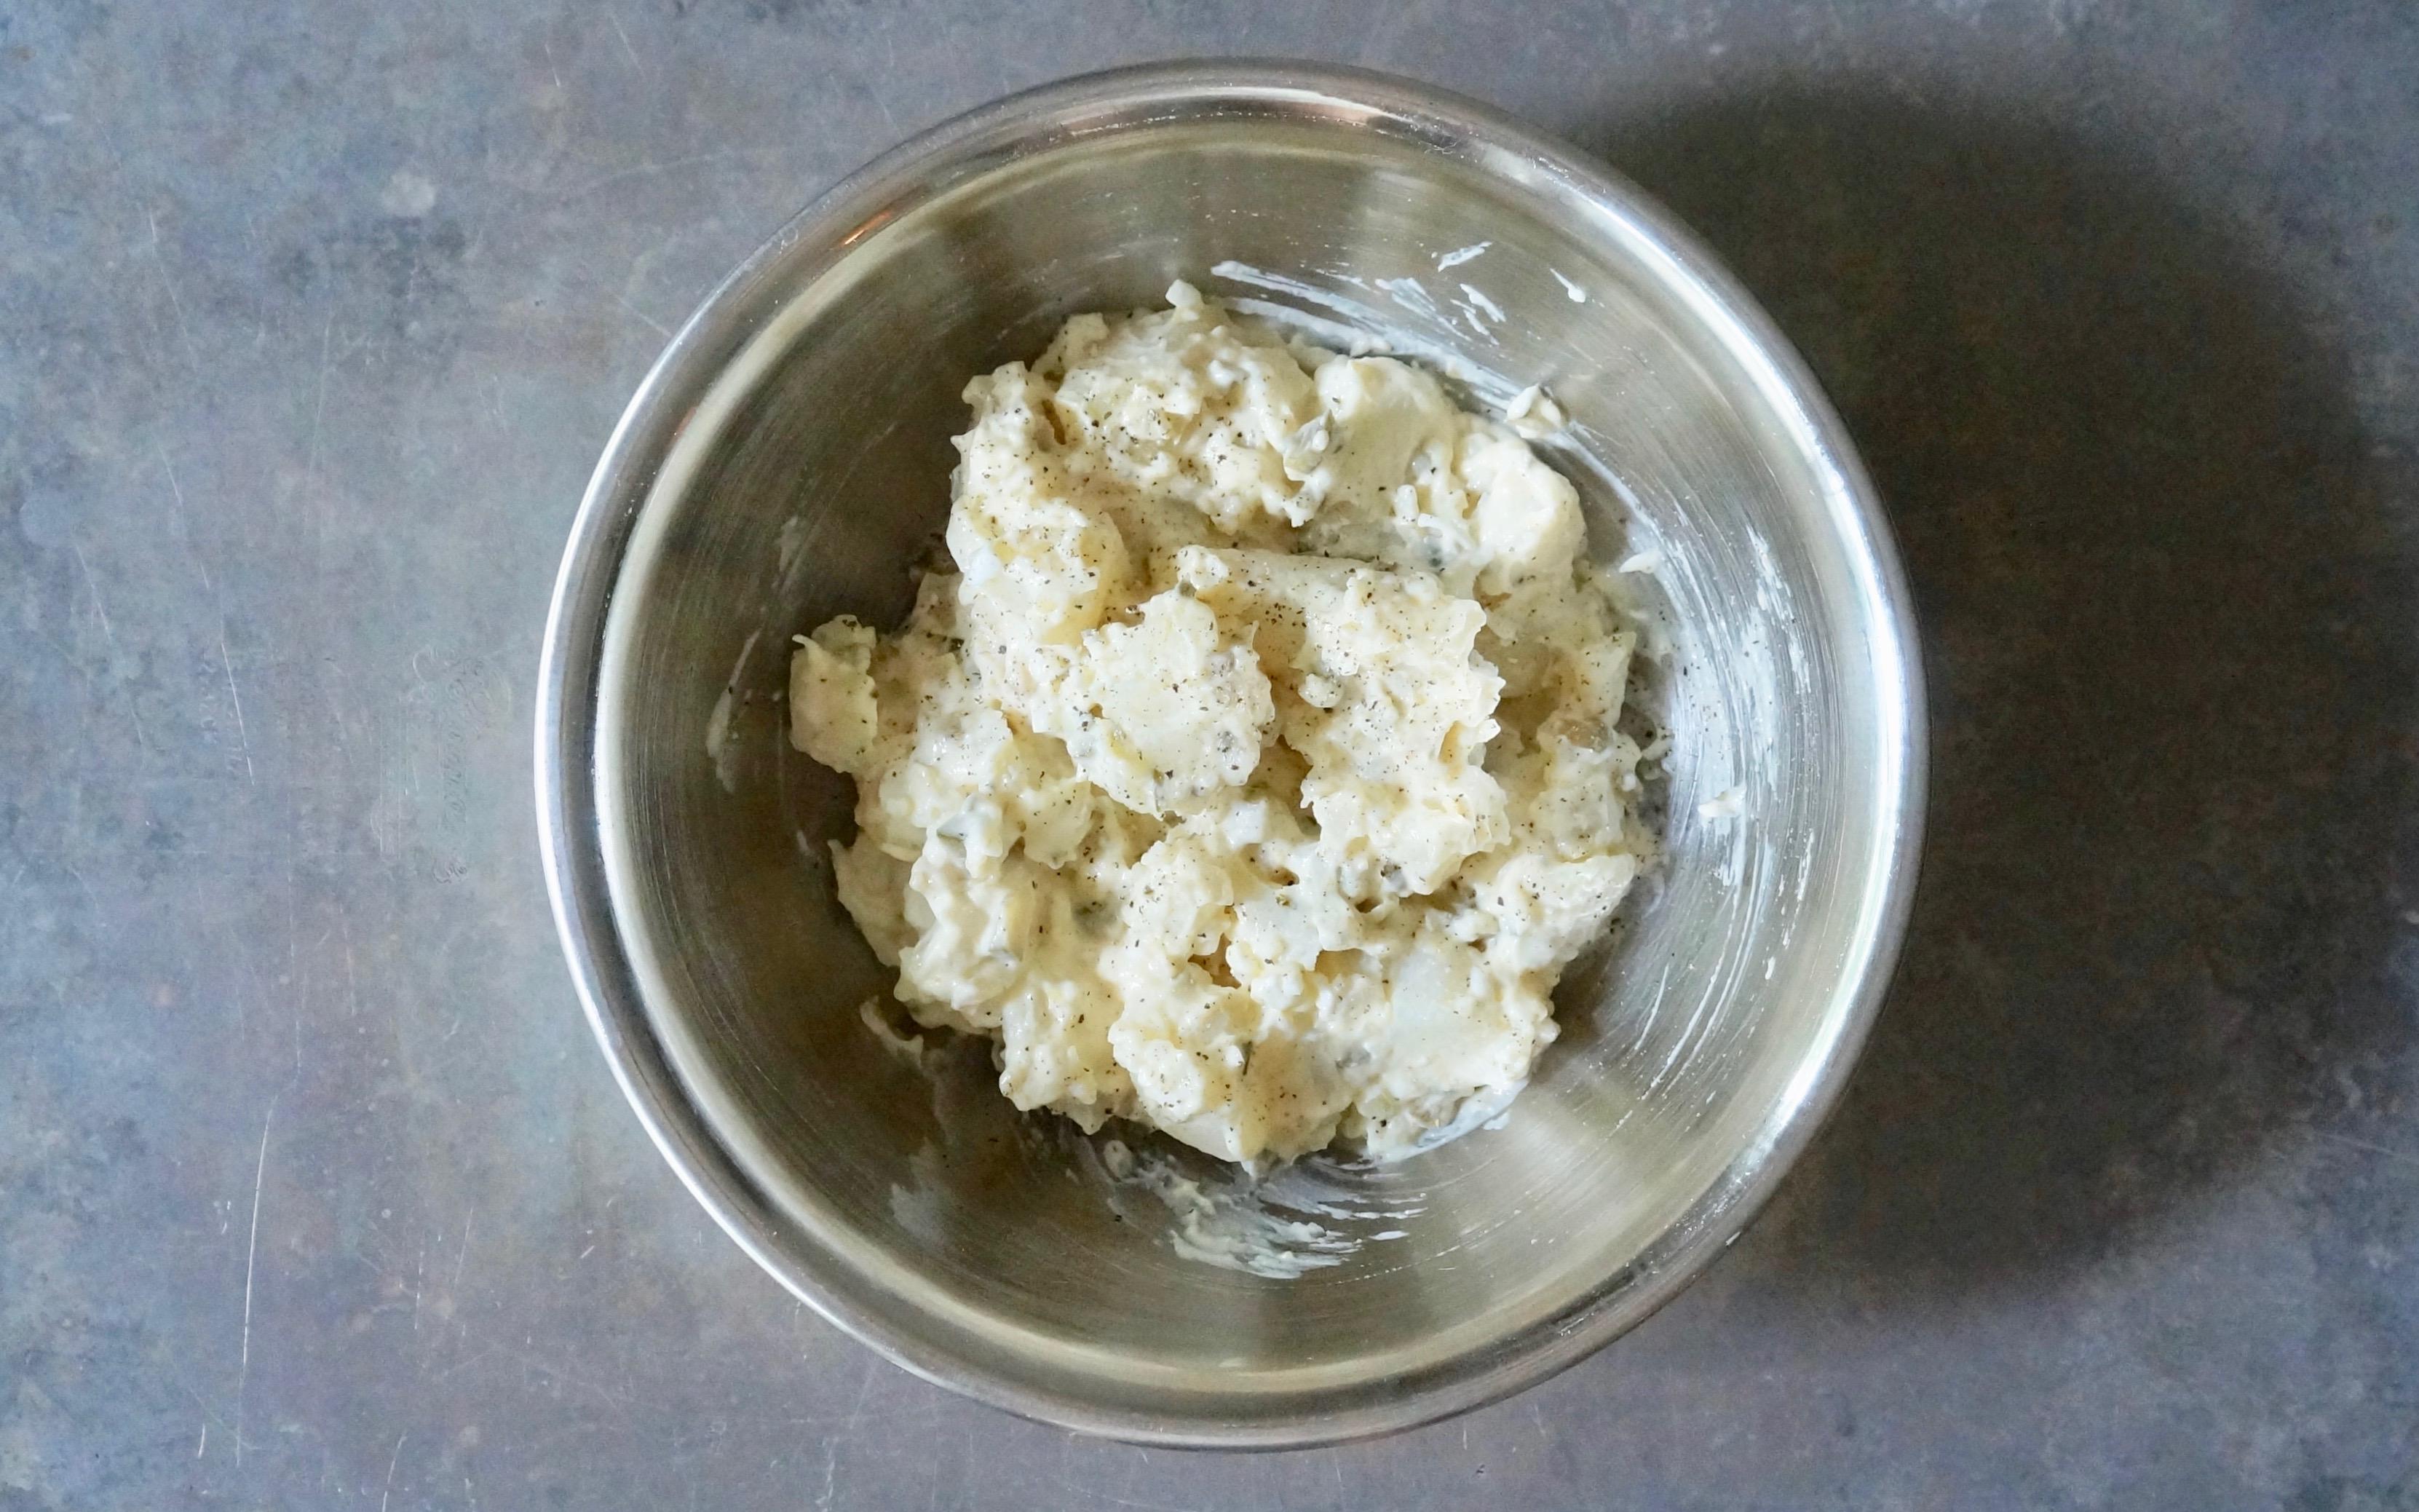 How-To-Make-Classic-Poato-Salad-Rebecca-Gordon-Publisher-Buttermilk-Lipstick-Culinary-Entertaining-Techniques-RebeccaGordon-Southern-Hostess-Pastry-Chef-Birmingham-Alabama